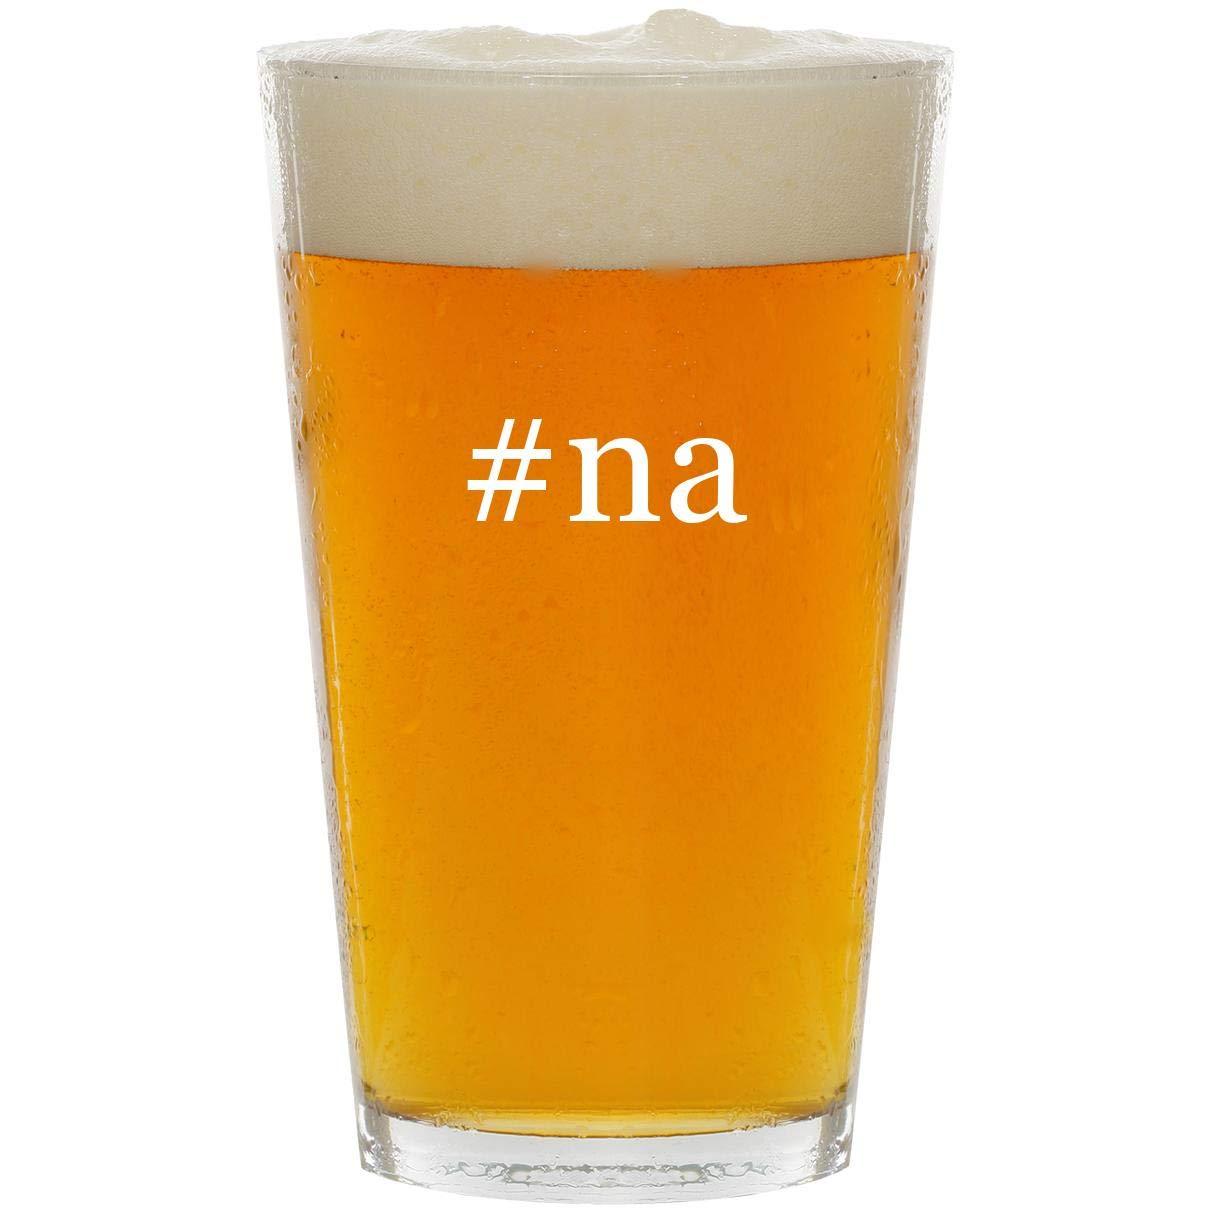 #na - Glass Hashtag 16oz Beer Pint